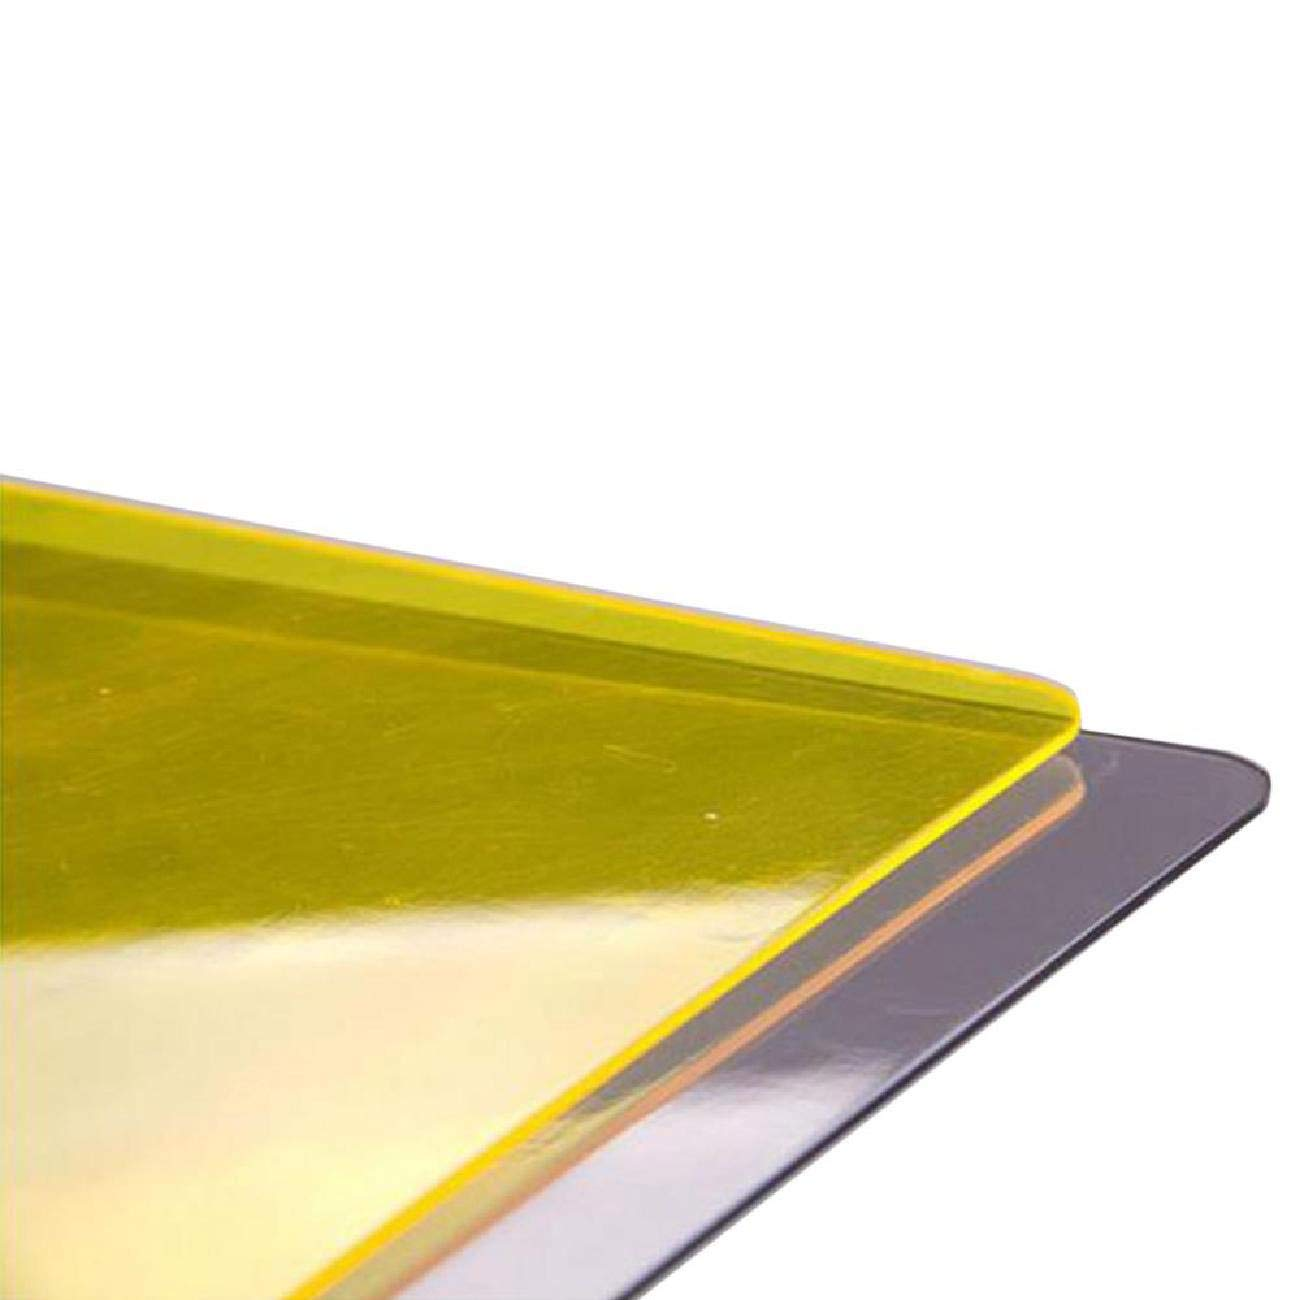 WICHEMI Day//Night Anti Glare Visor Driving HD Vision Car Glasses Windshield Driving Visor,Universal Sunshade Mirror Goggles Shield